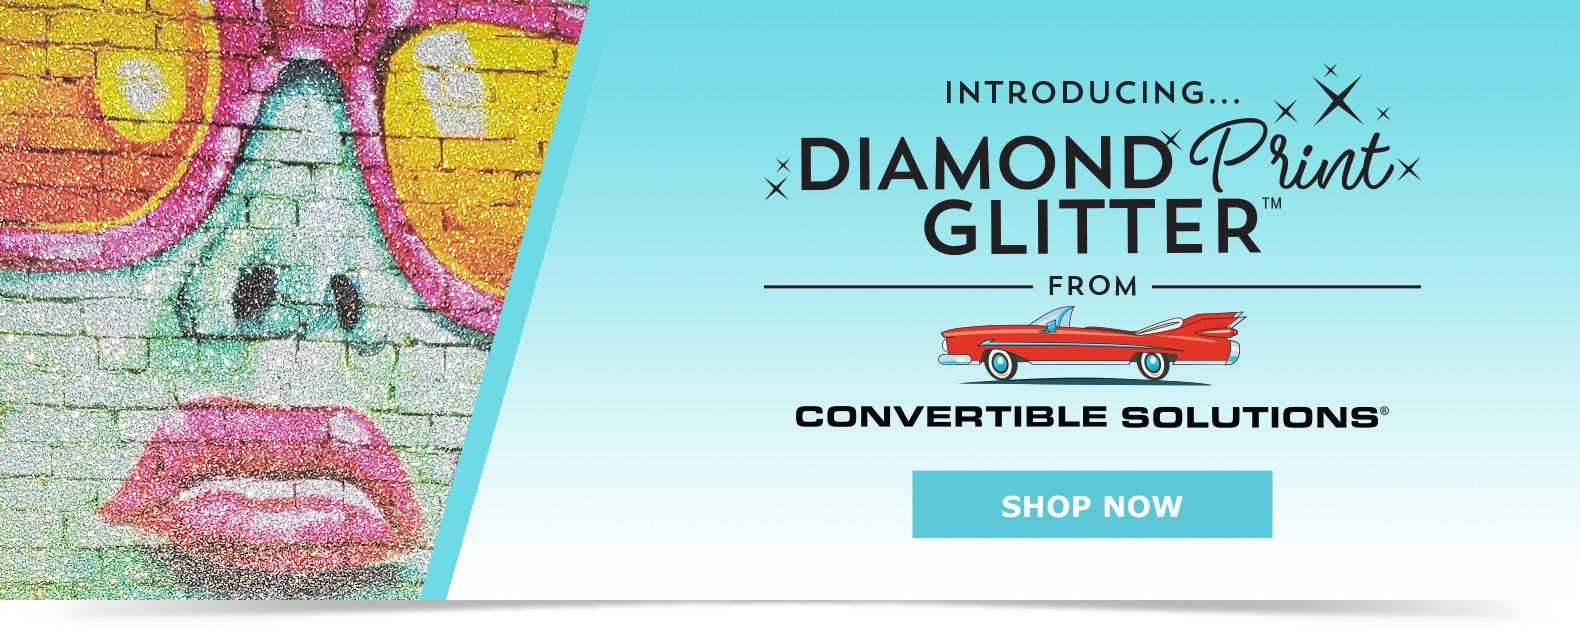 Diamond Print Glitter™